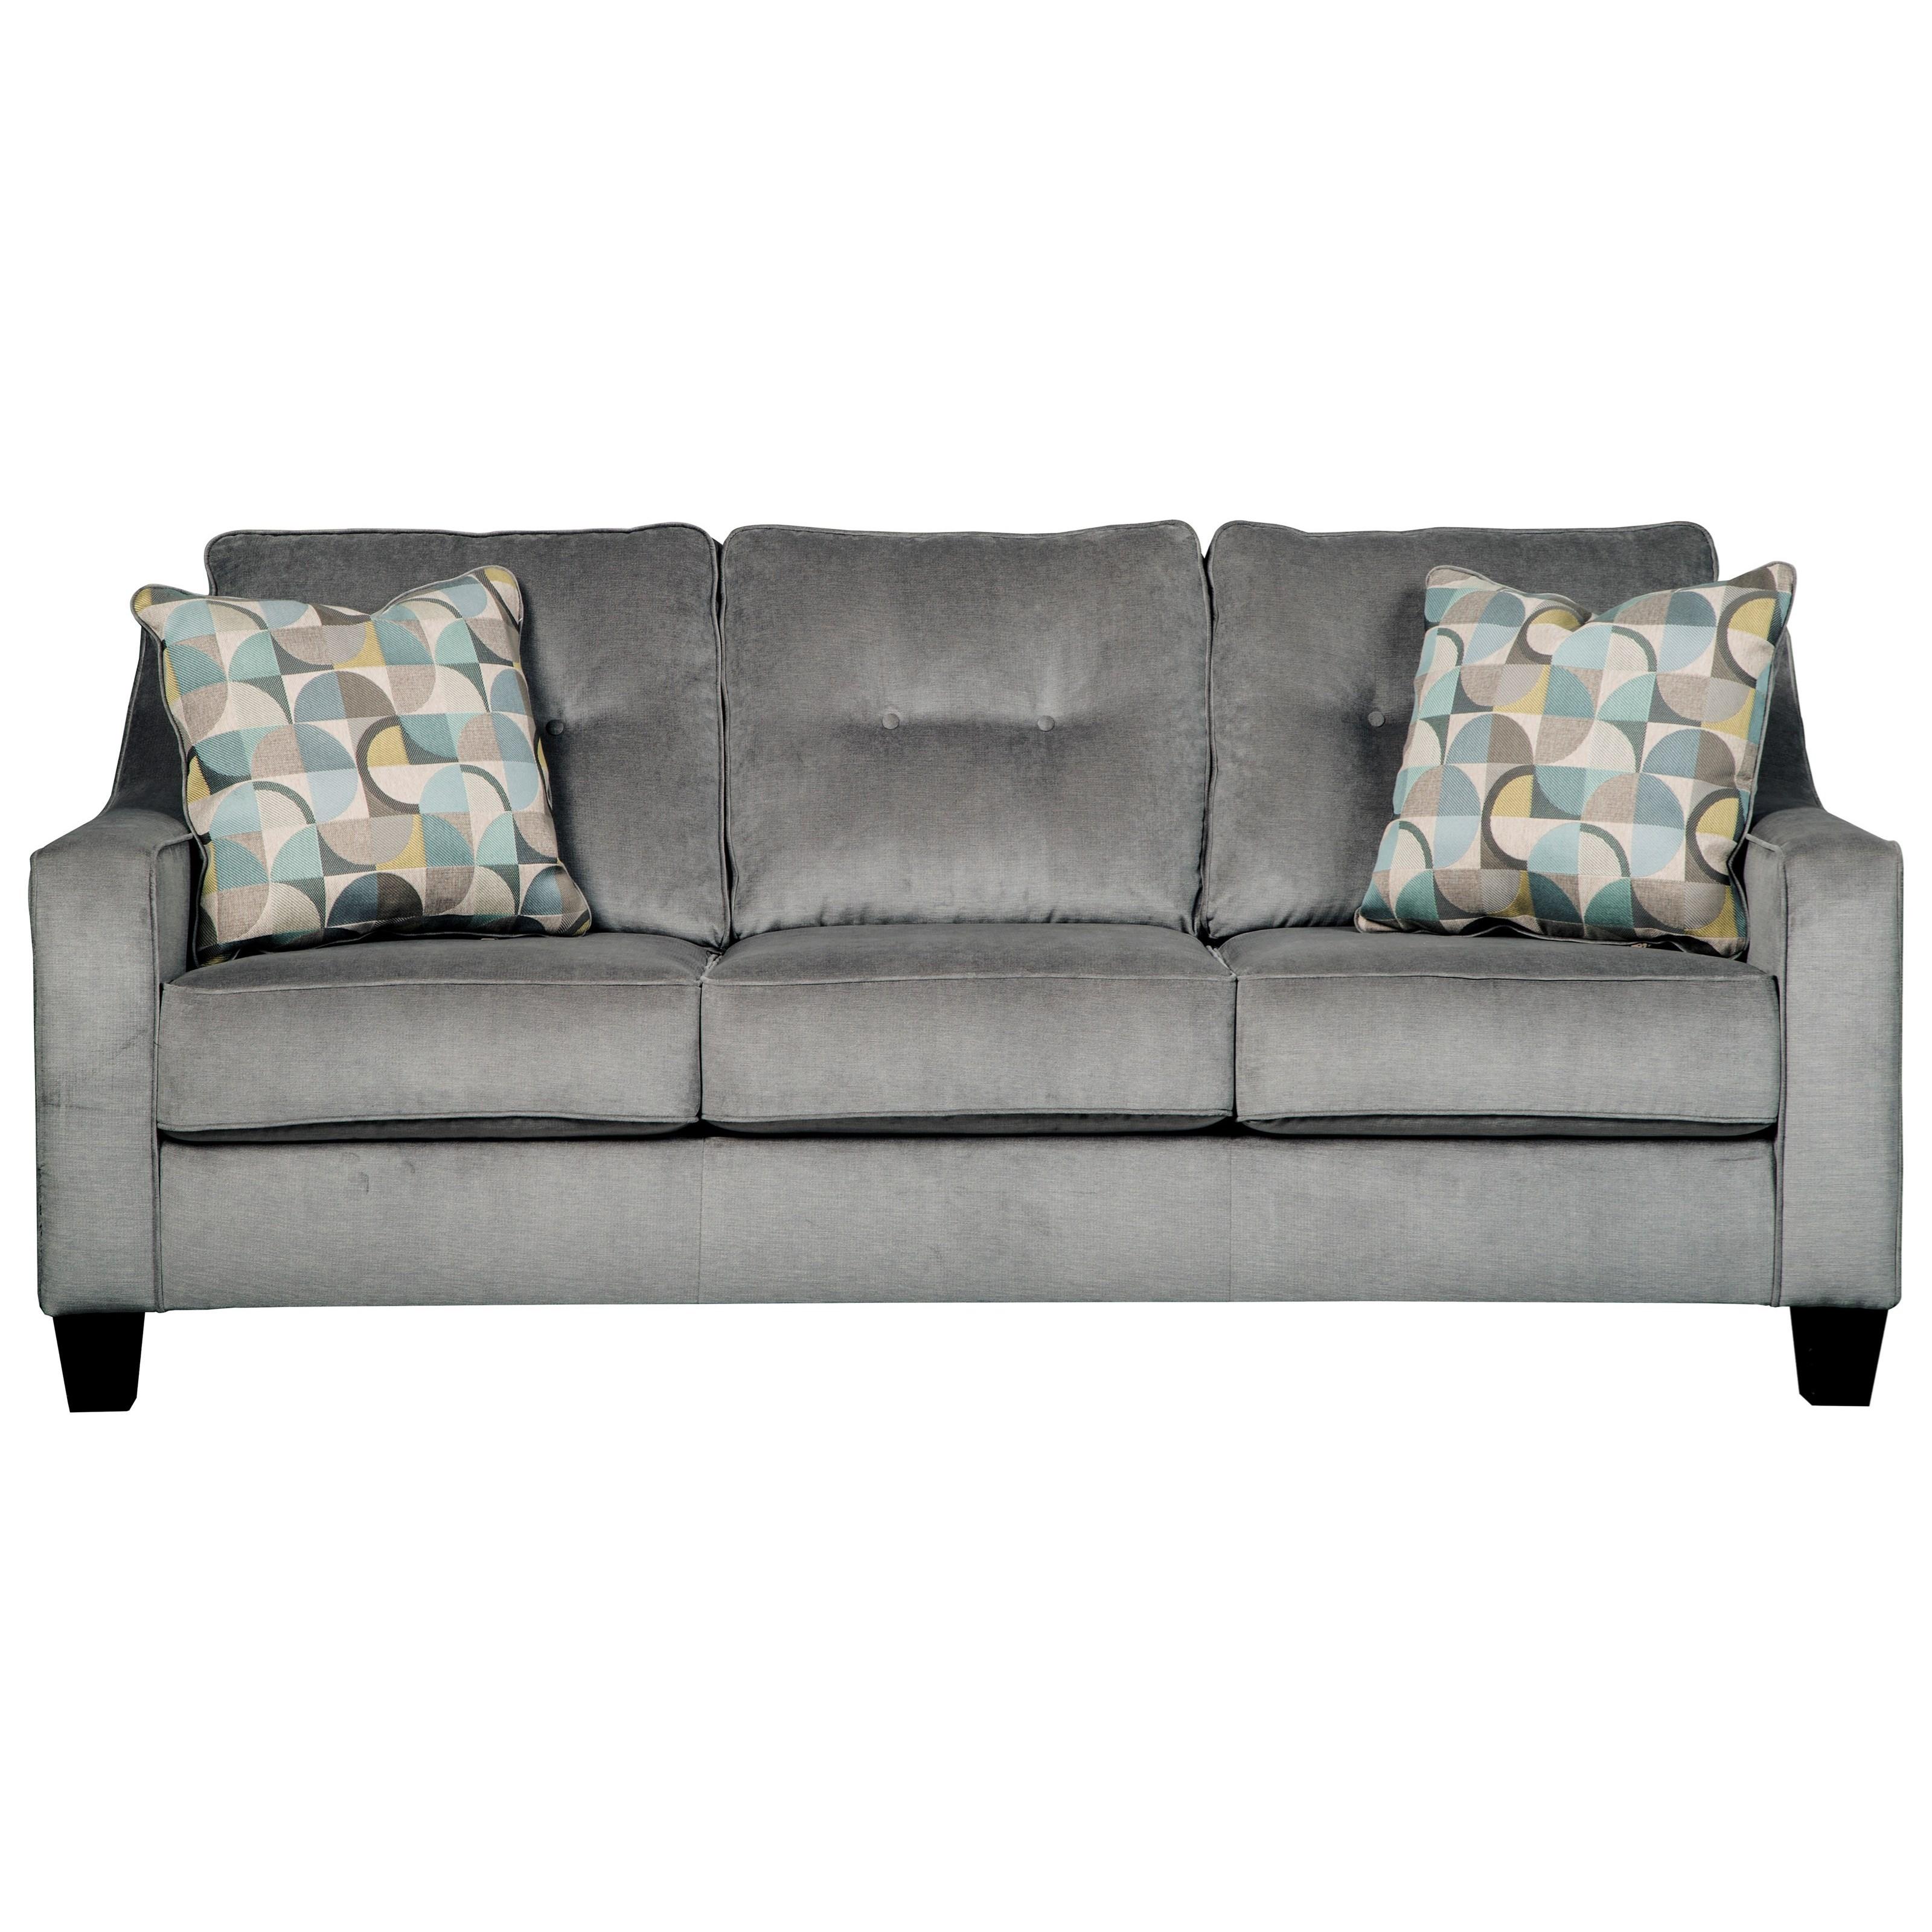 Benchcraft Bizzy Sofa - Item Number: 6950338